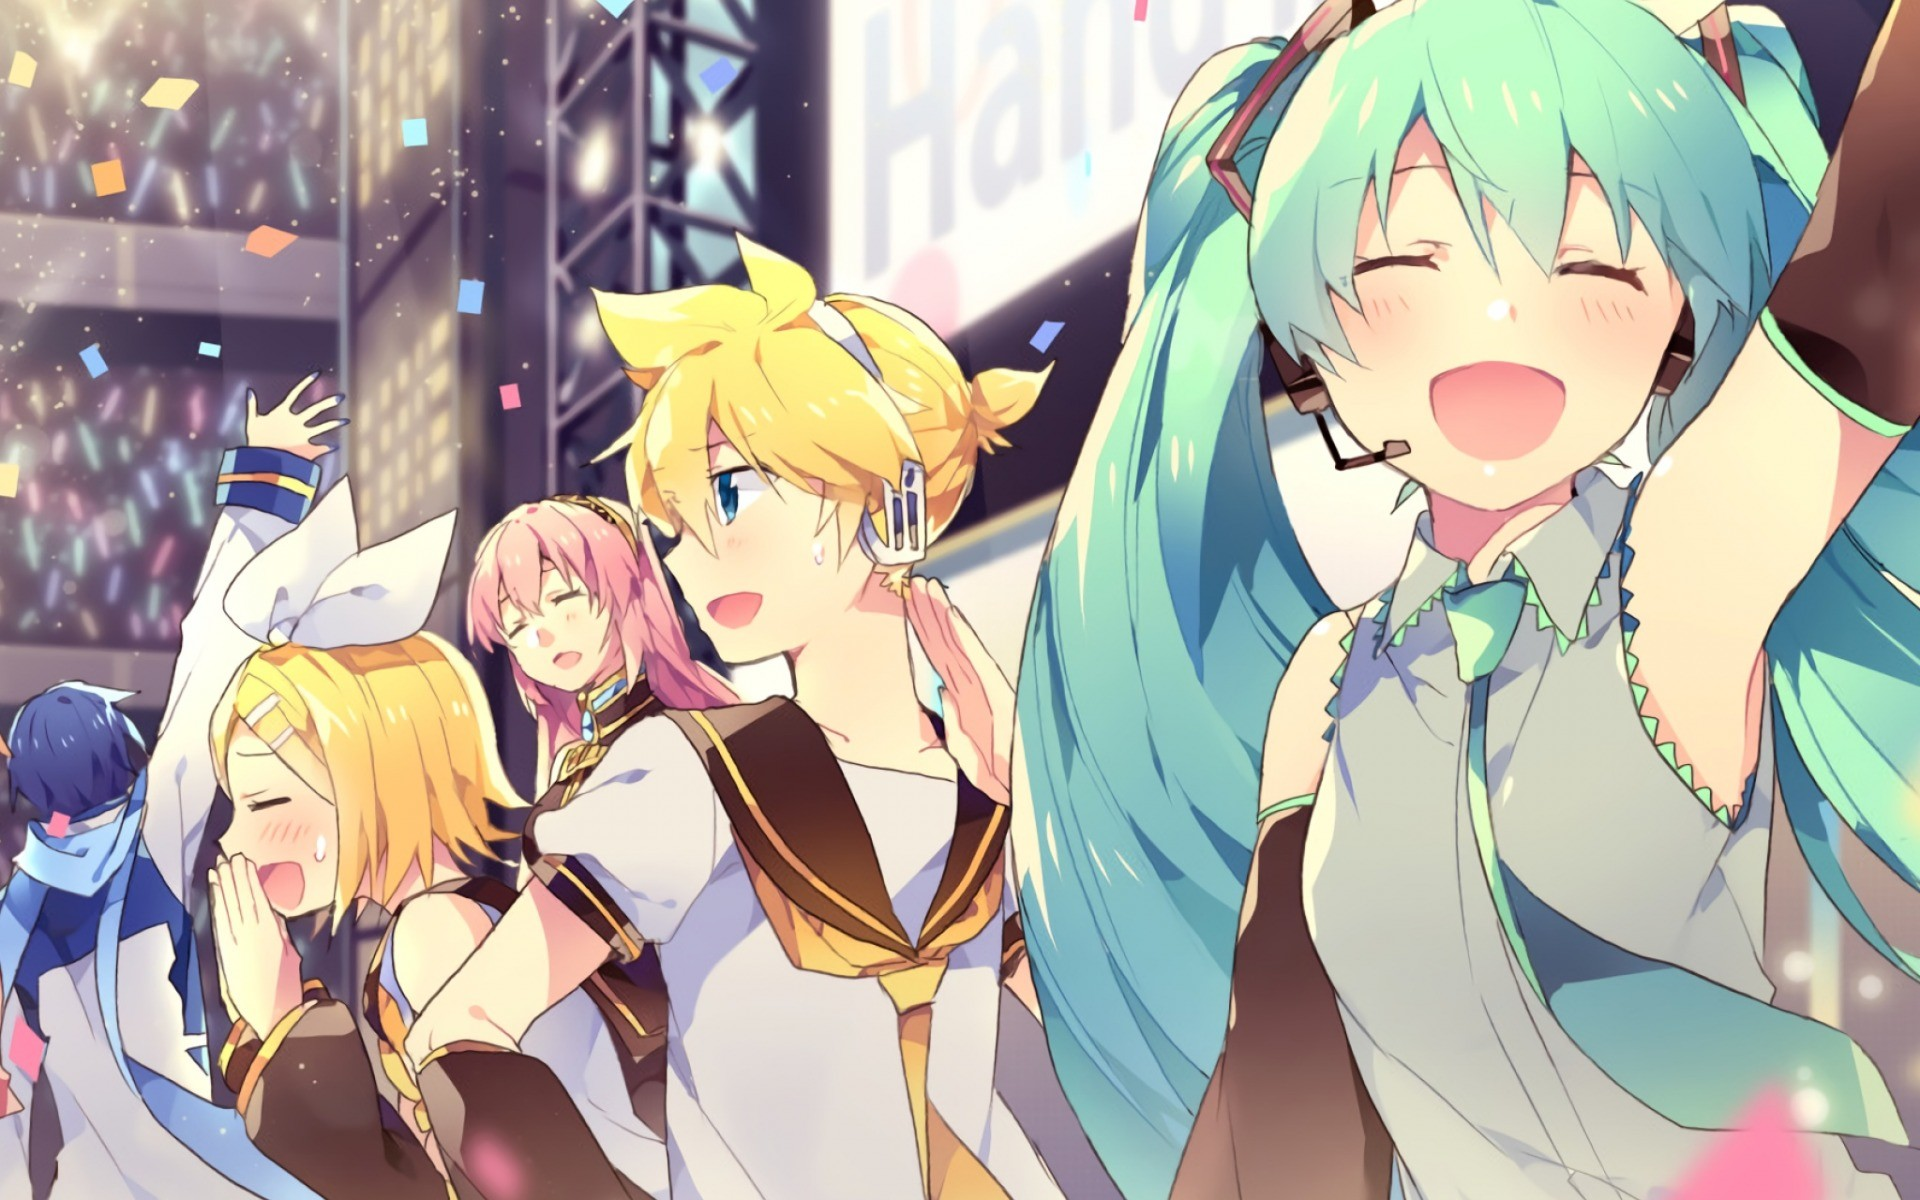 Res: 1920x1200, Vocaloid, Japanese manga, anime, Megurine Luka, Kagamine Rin, Kaito,  Kagamine